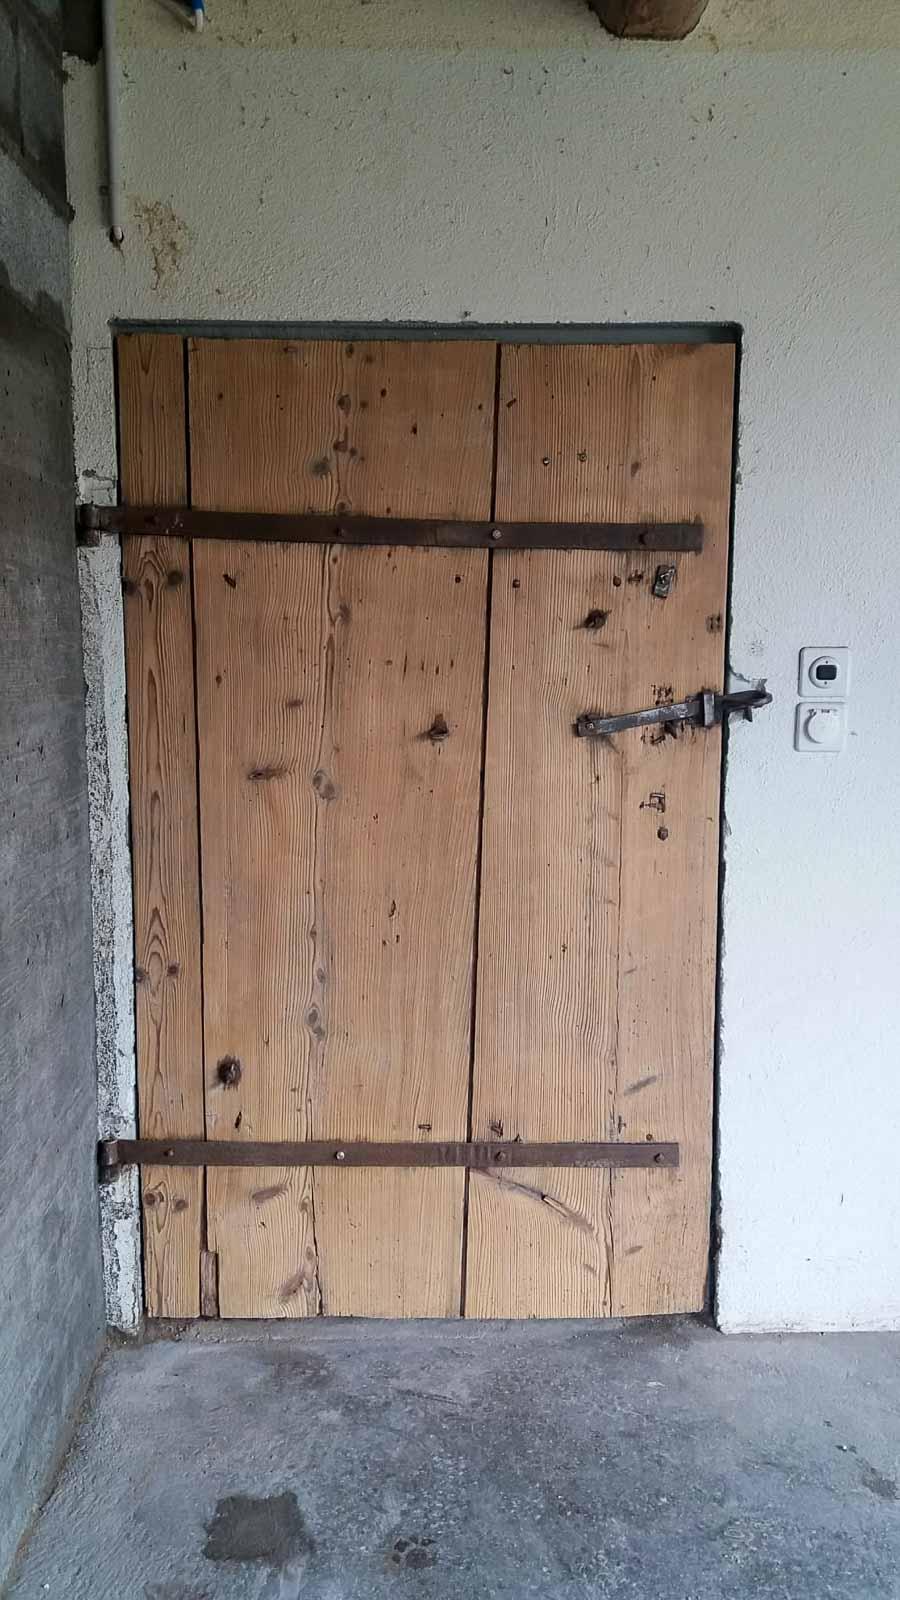 Wooddesign_Holzdesign_Altholz_restaurieren_Altholz gebürstet_Türen (5)